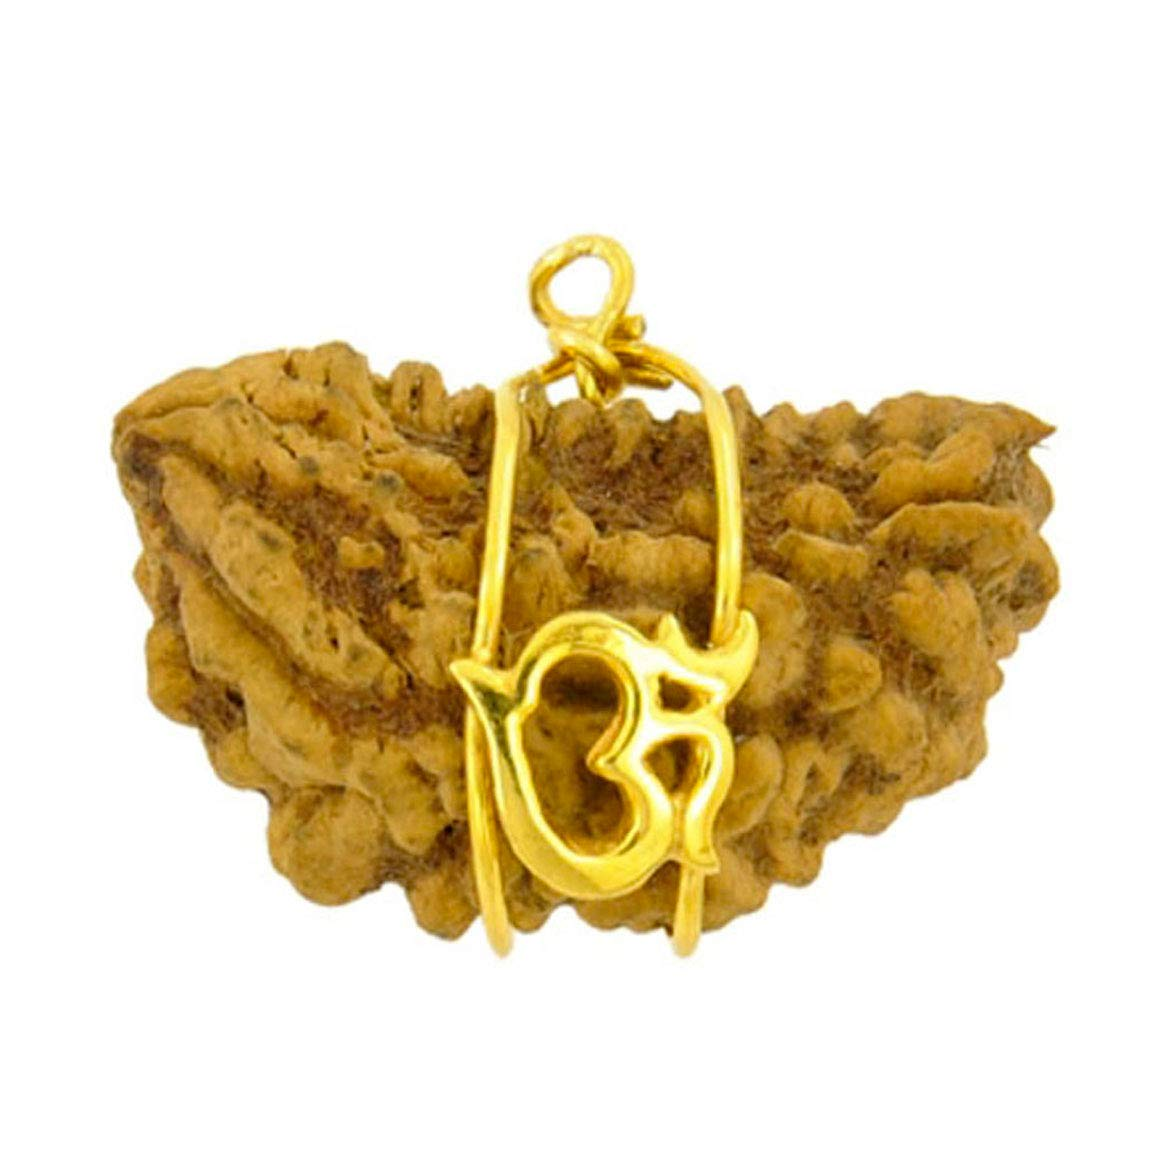 Gemsonclick Natural 1 Mukhi One Face Rudraksha Anhä nger Gebetskette OM Gold plattiert Medaillon Healing Chakra